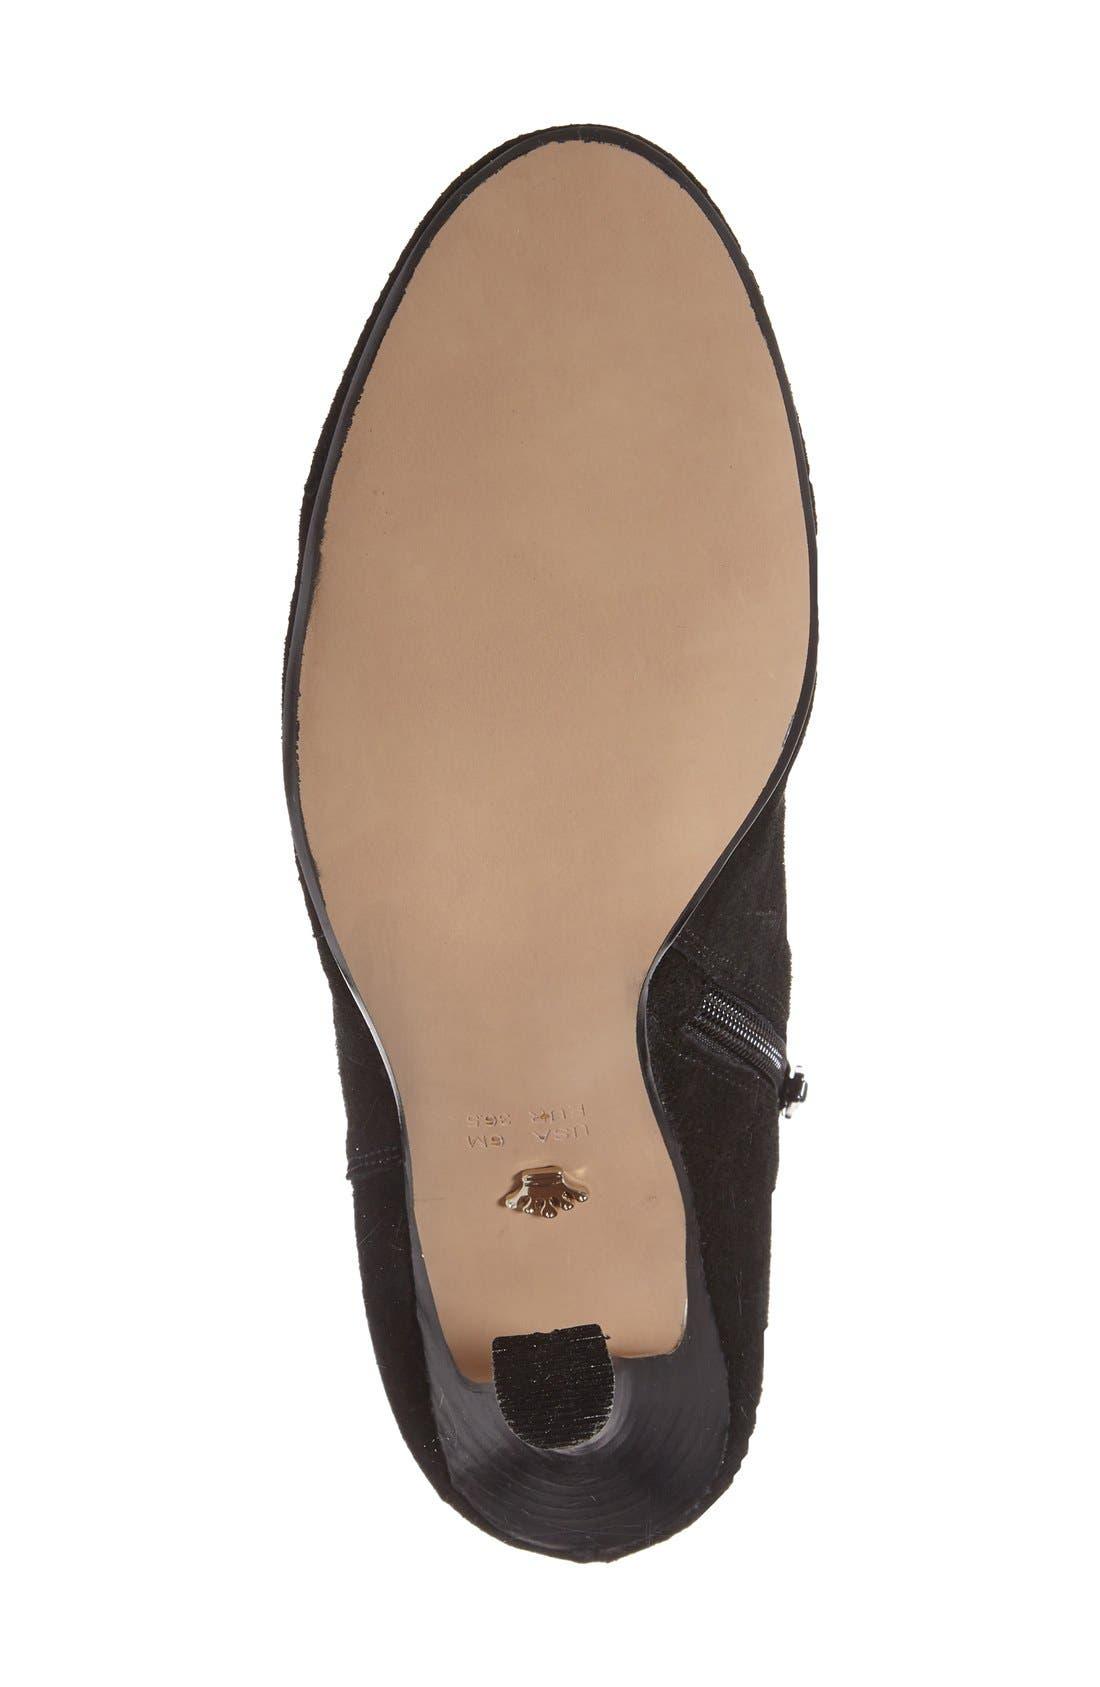 Nina 'Iolathe' Flared Heel Bootie,                             Alternate thumbnail 10, color,